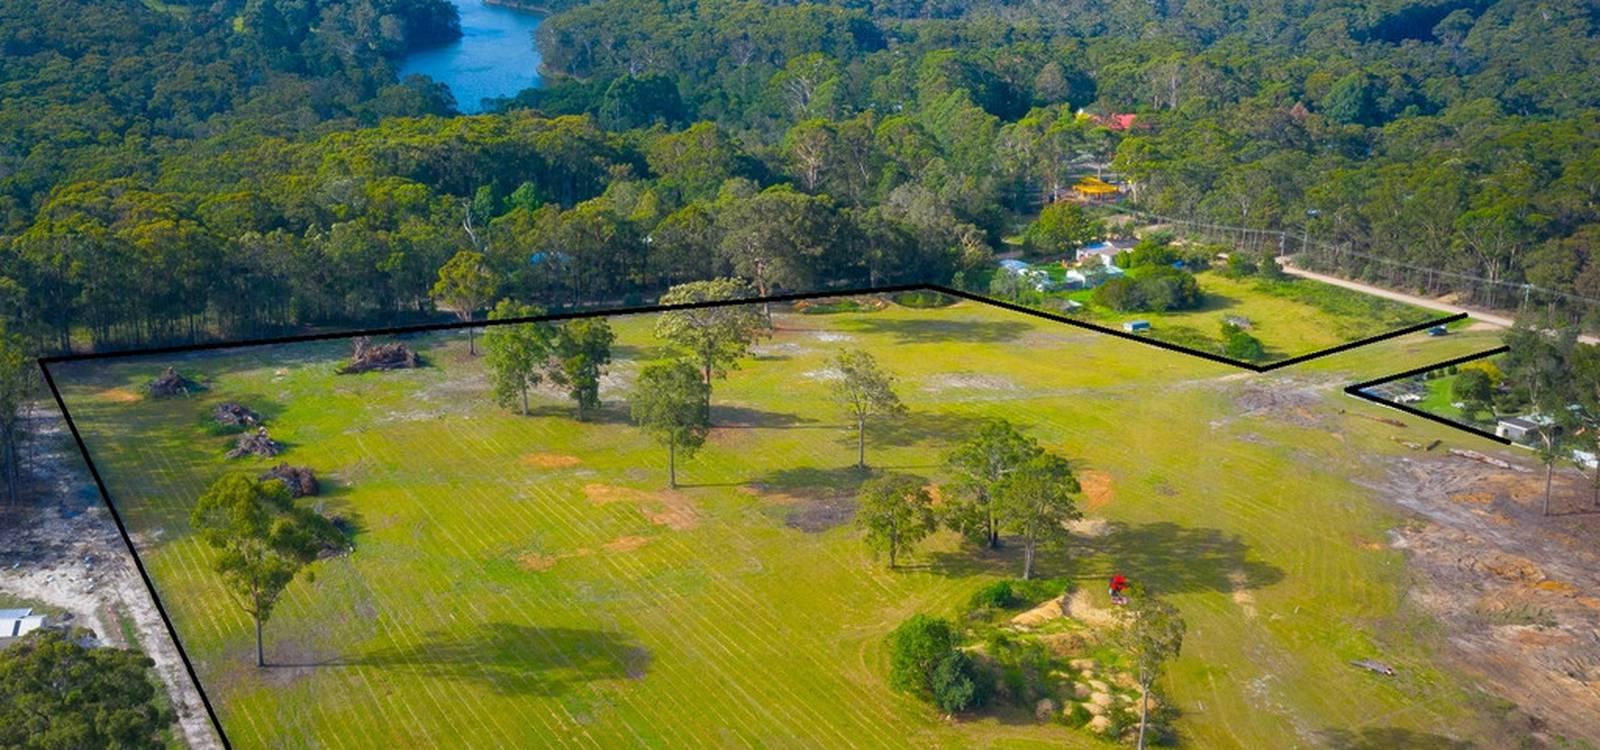 Lot 18 LOMANDRA AVENUE KALARU, NSW 2550 - photo 1